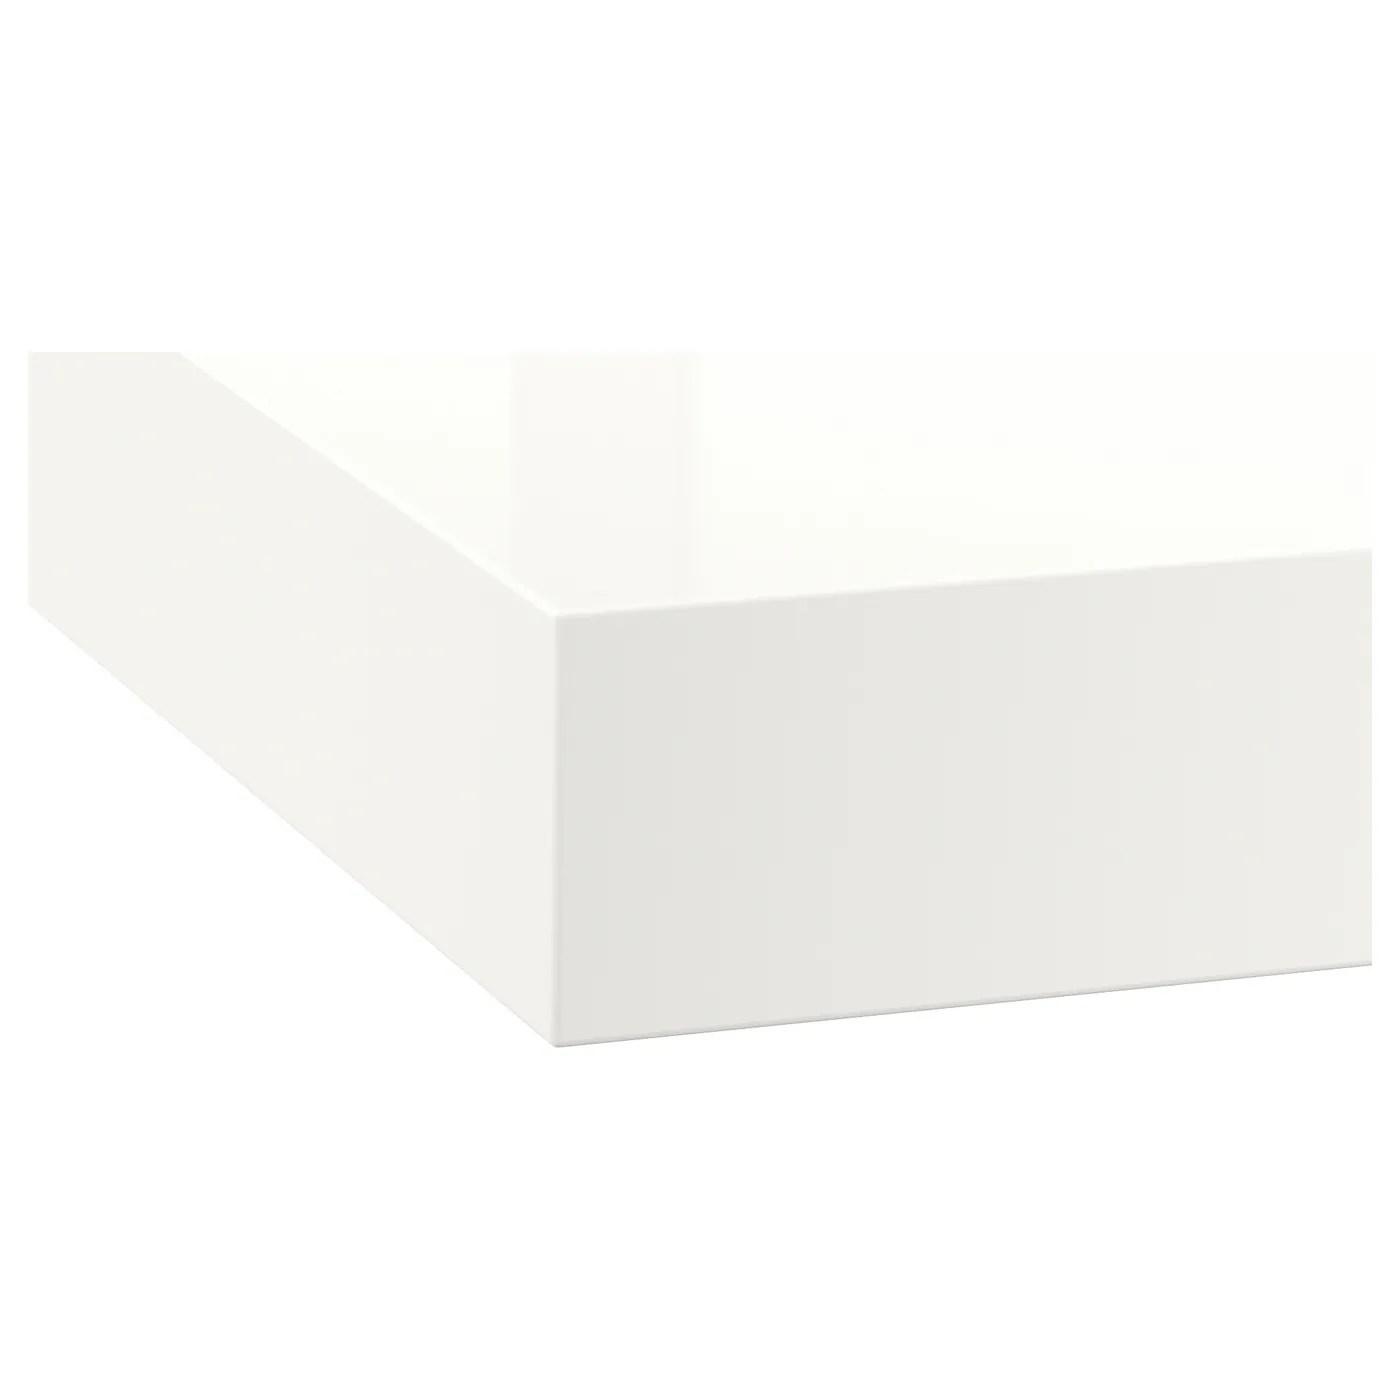 Deje Plan De Travail Sur Mesure Blanc Brillant Stratifie 63 Ikea